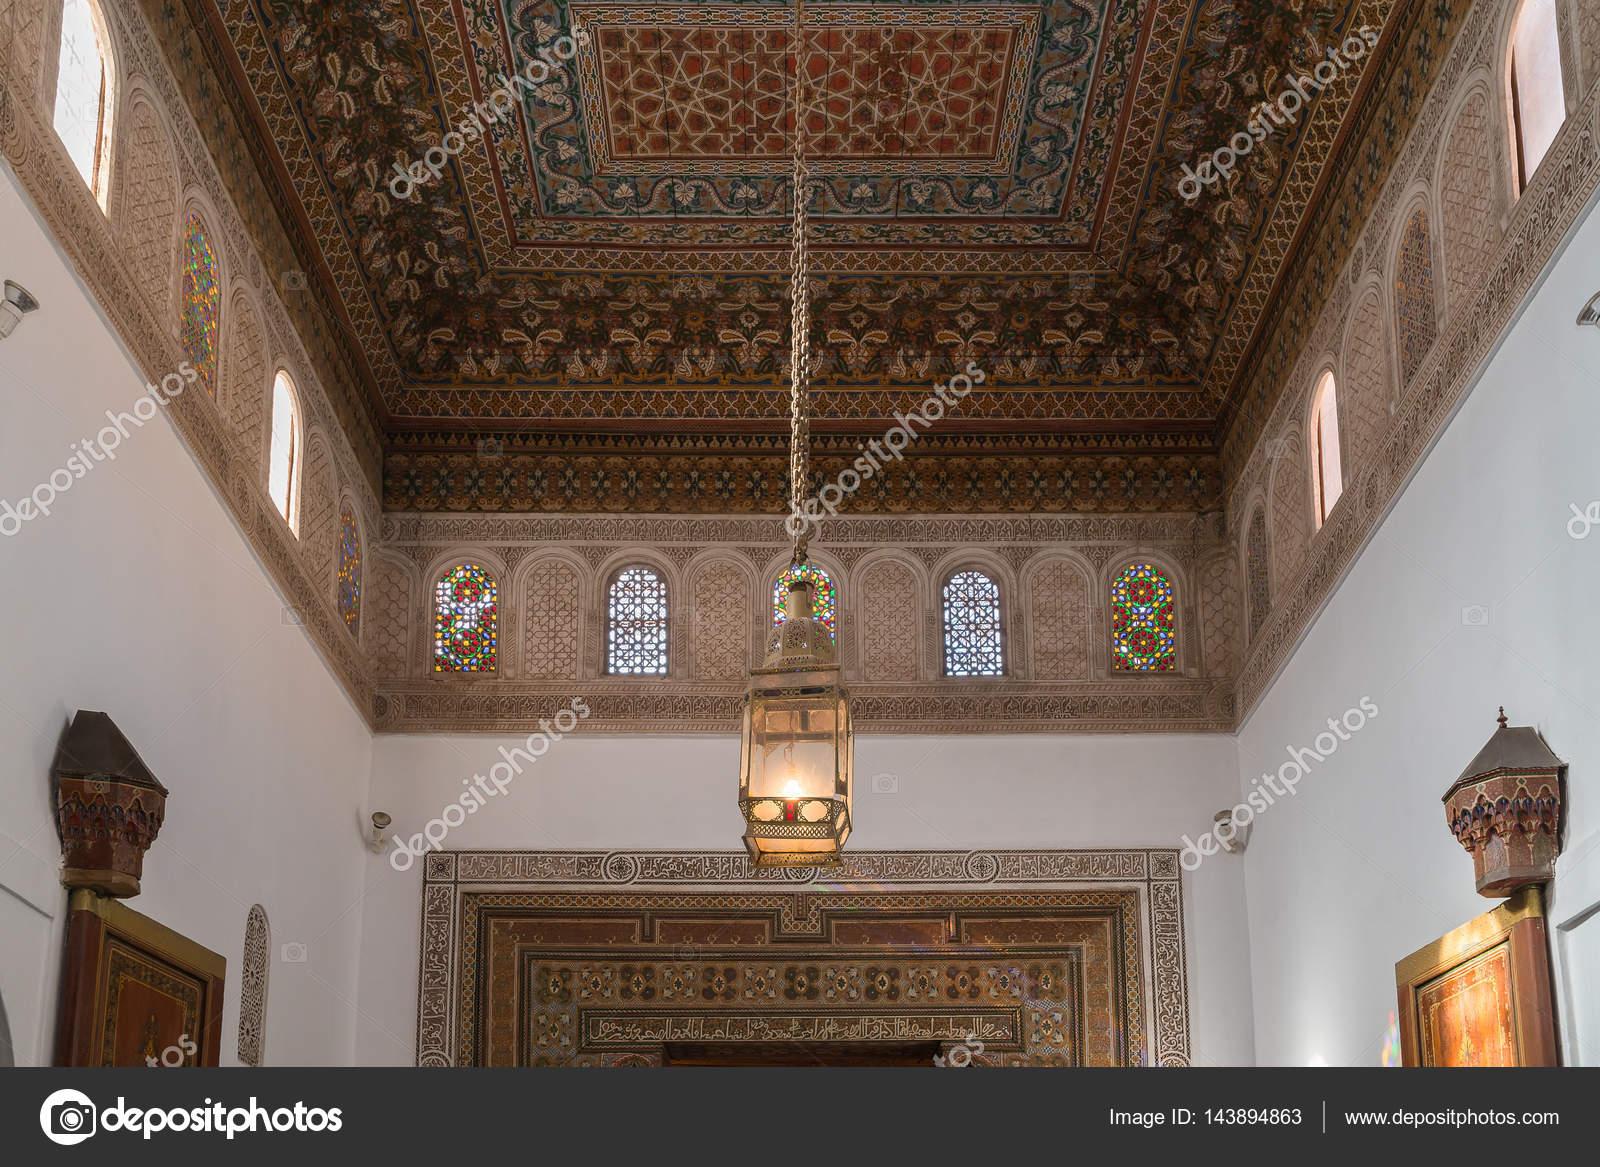 Decoratie in het bahia palace marokko u stockfoto praphab